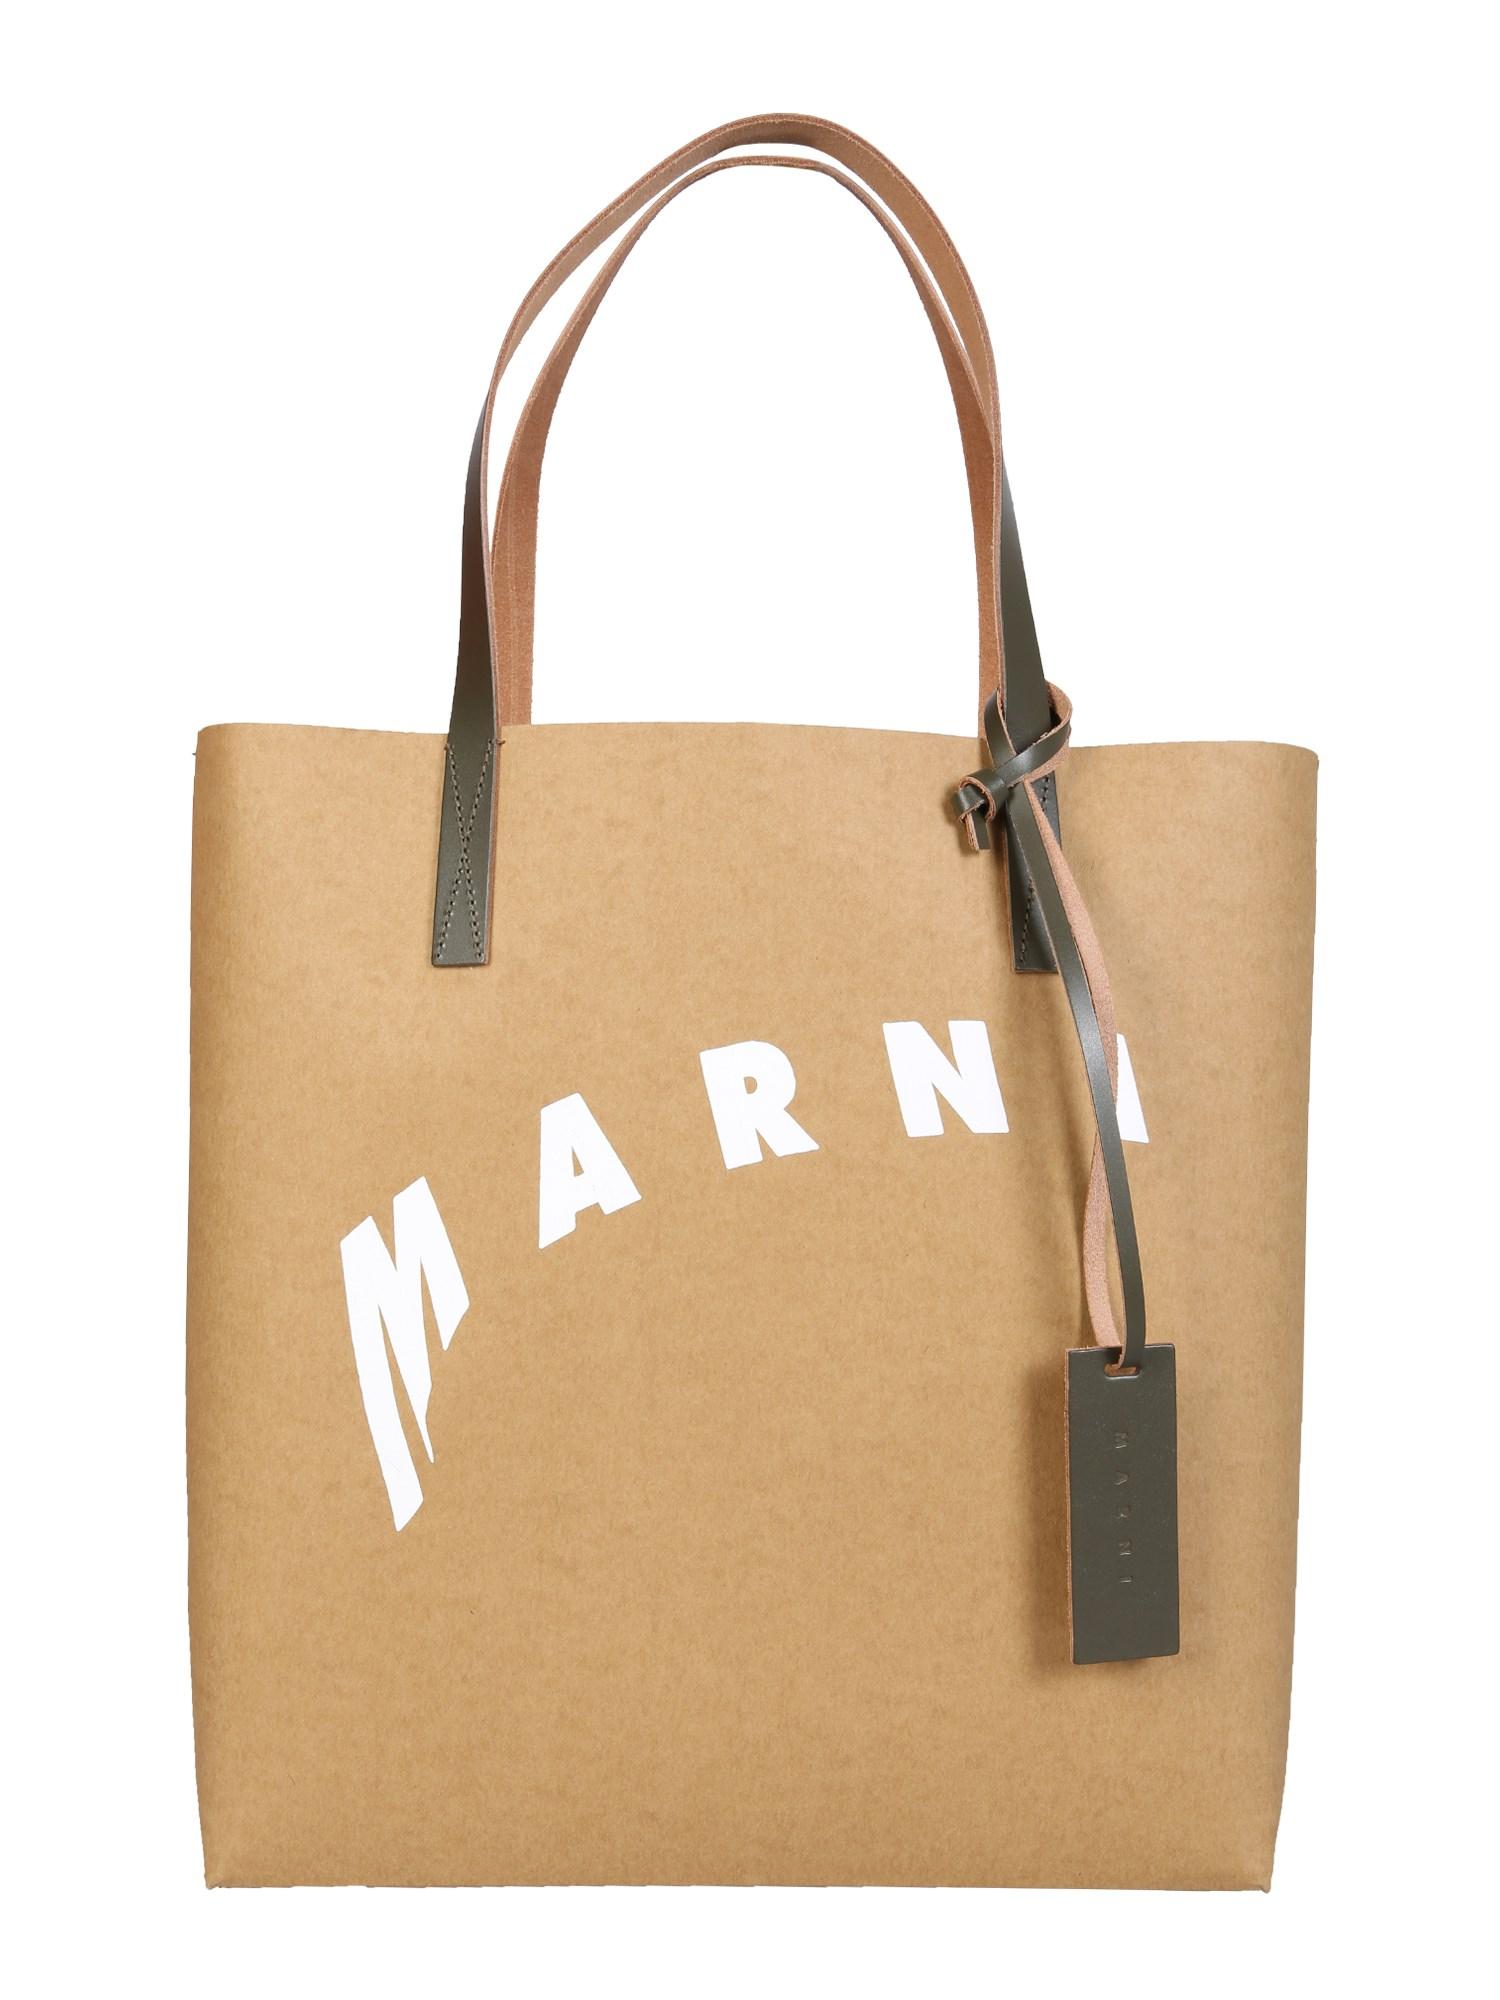 marni shopping bag with distorted logo